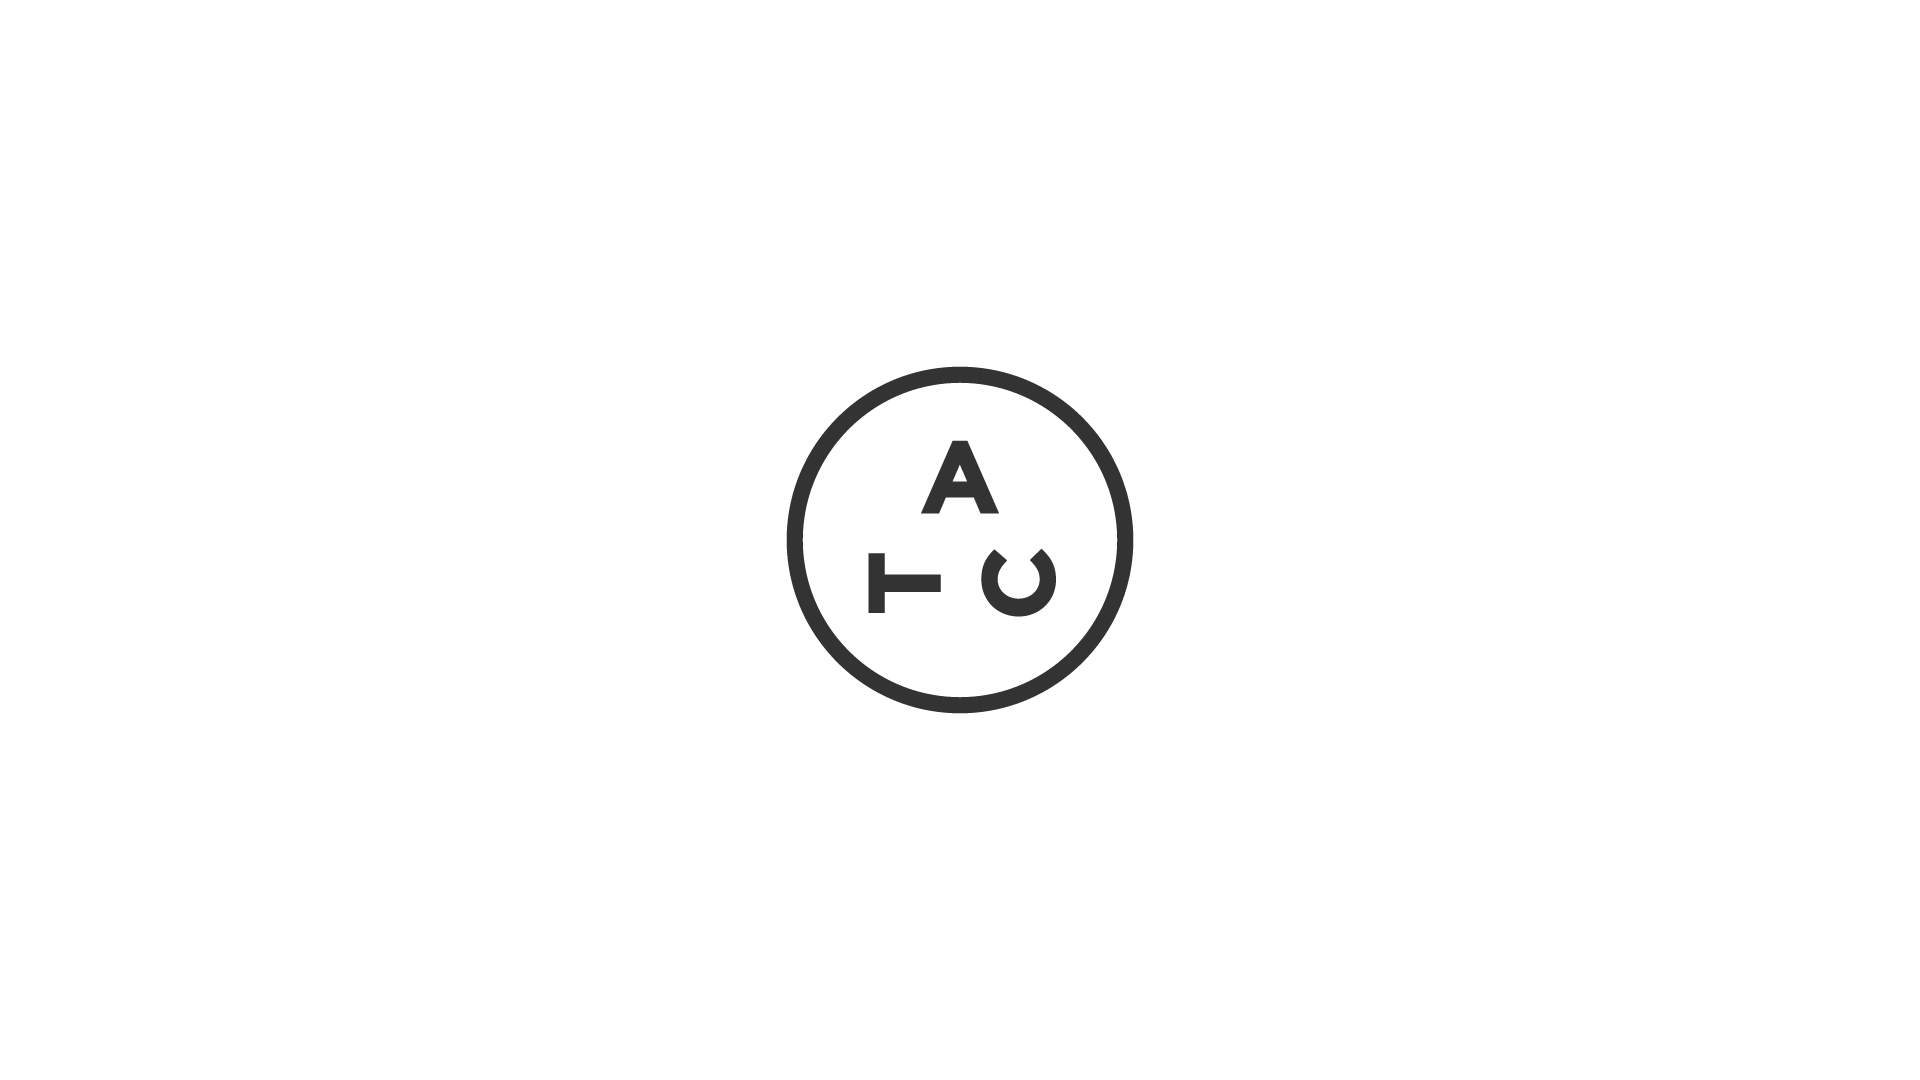 atc-oglogo-09